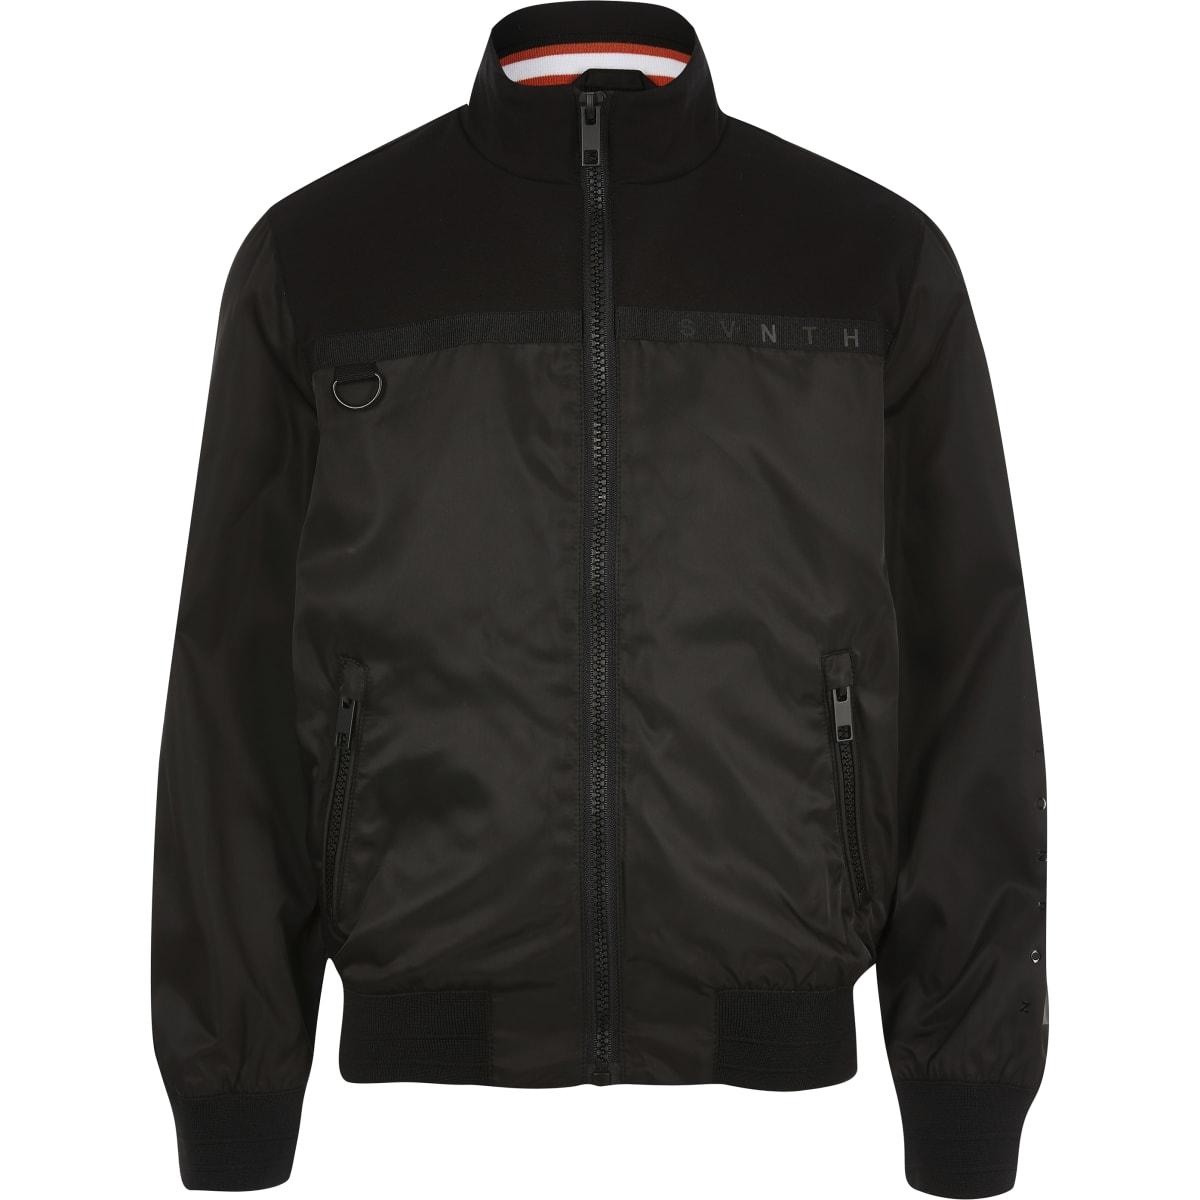 Boys black Svnth long sleeve jacket